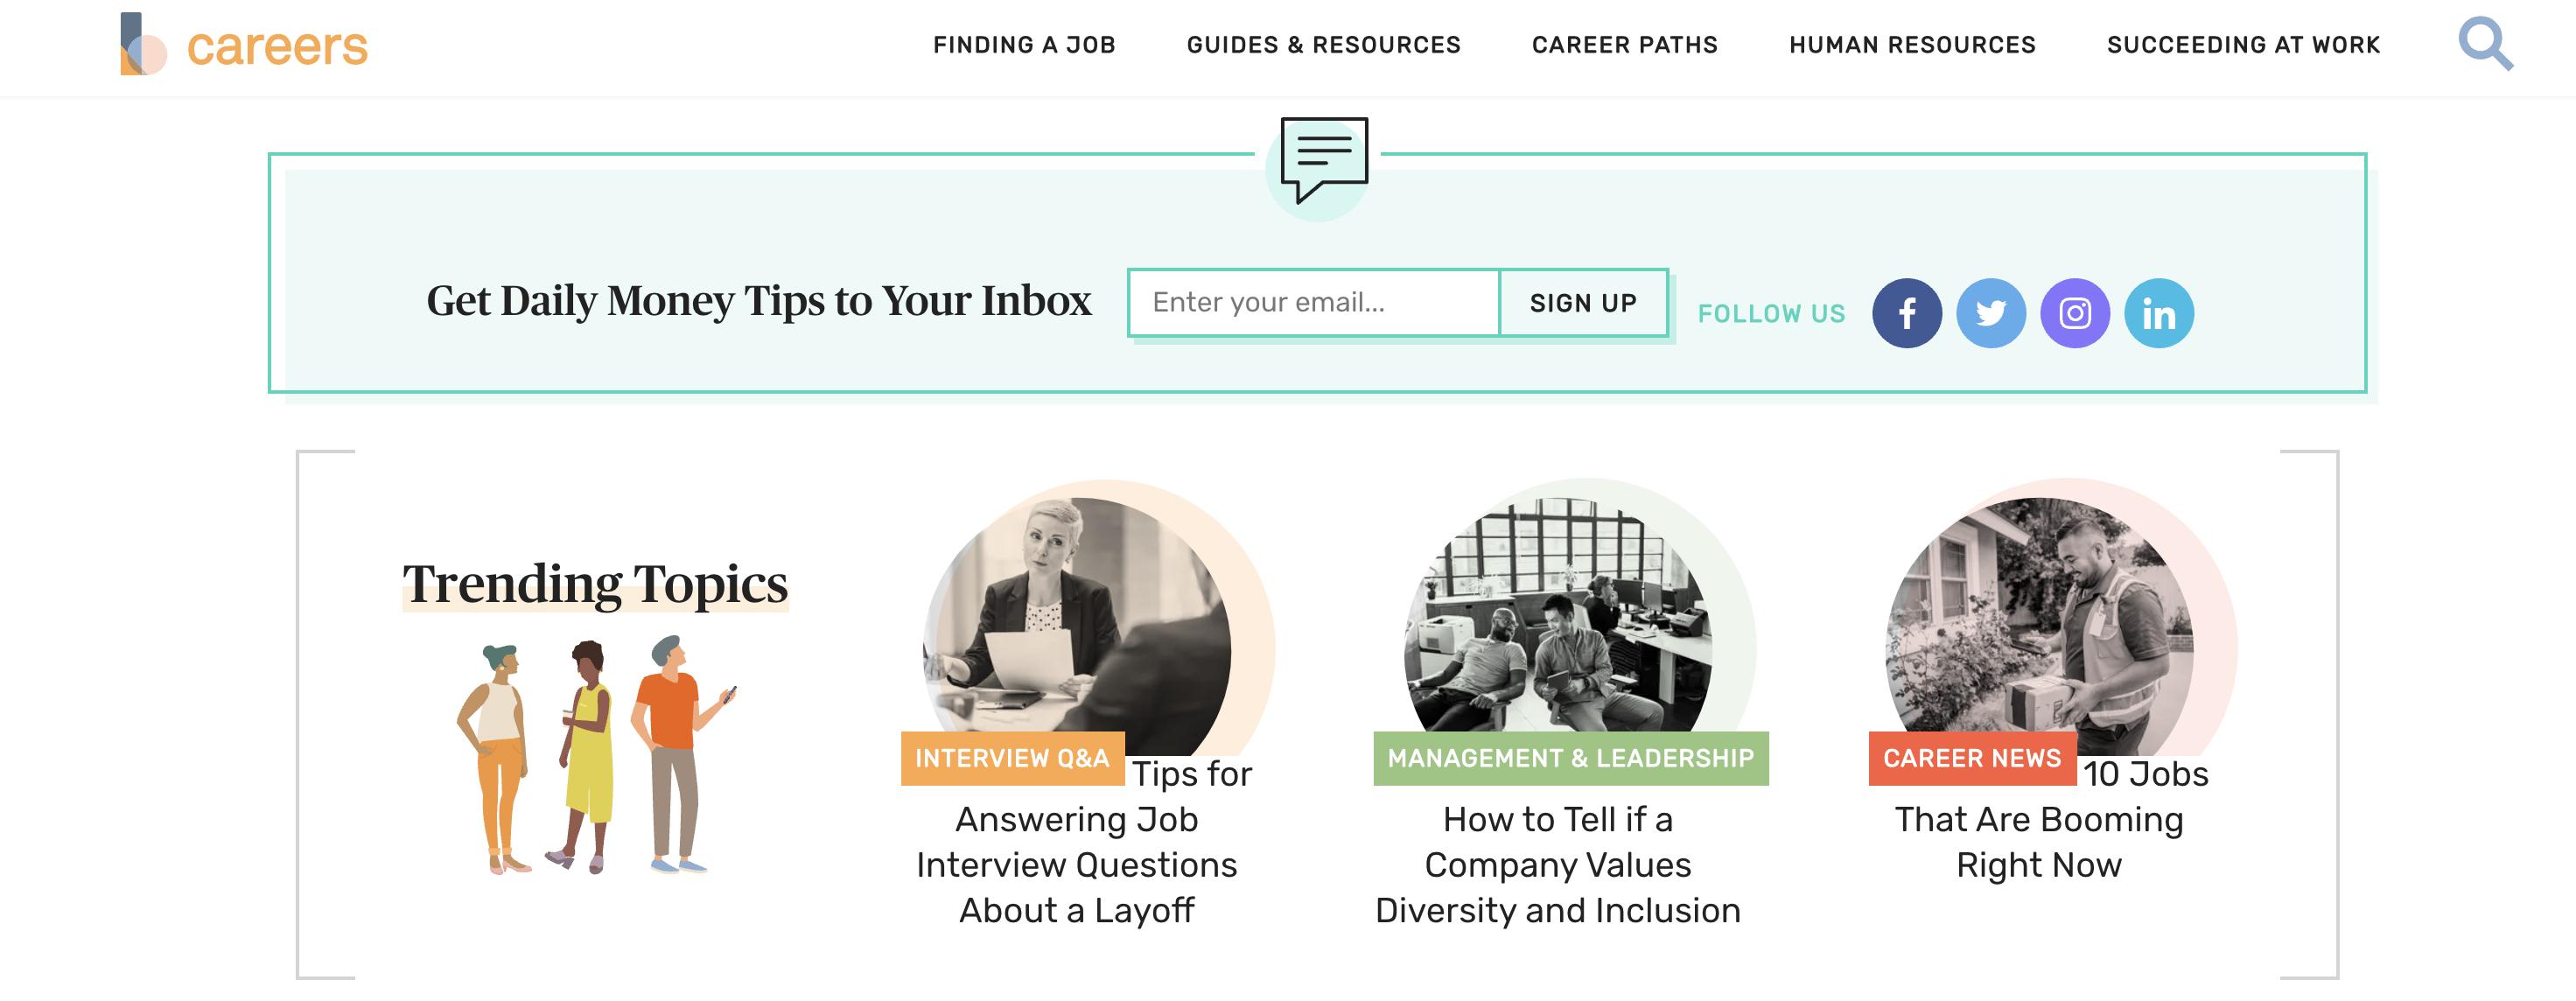 5 Best Agencies That Help You Find Jobs (Plus 3 Free)